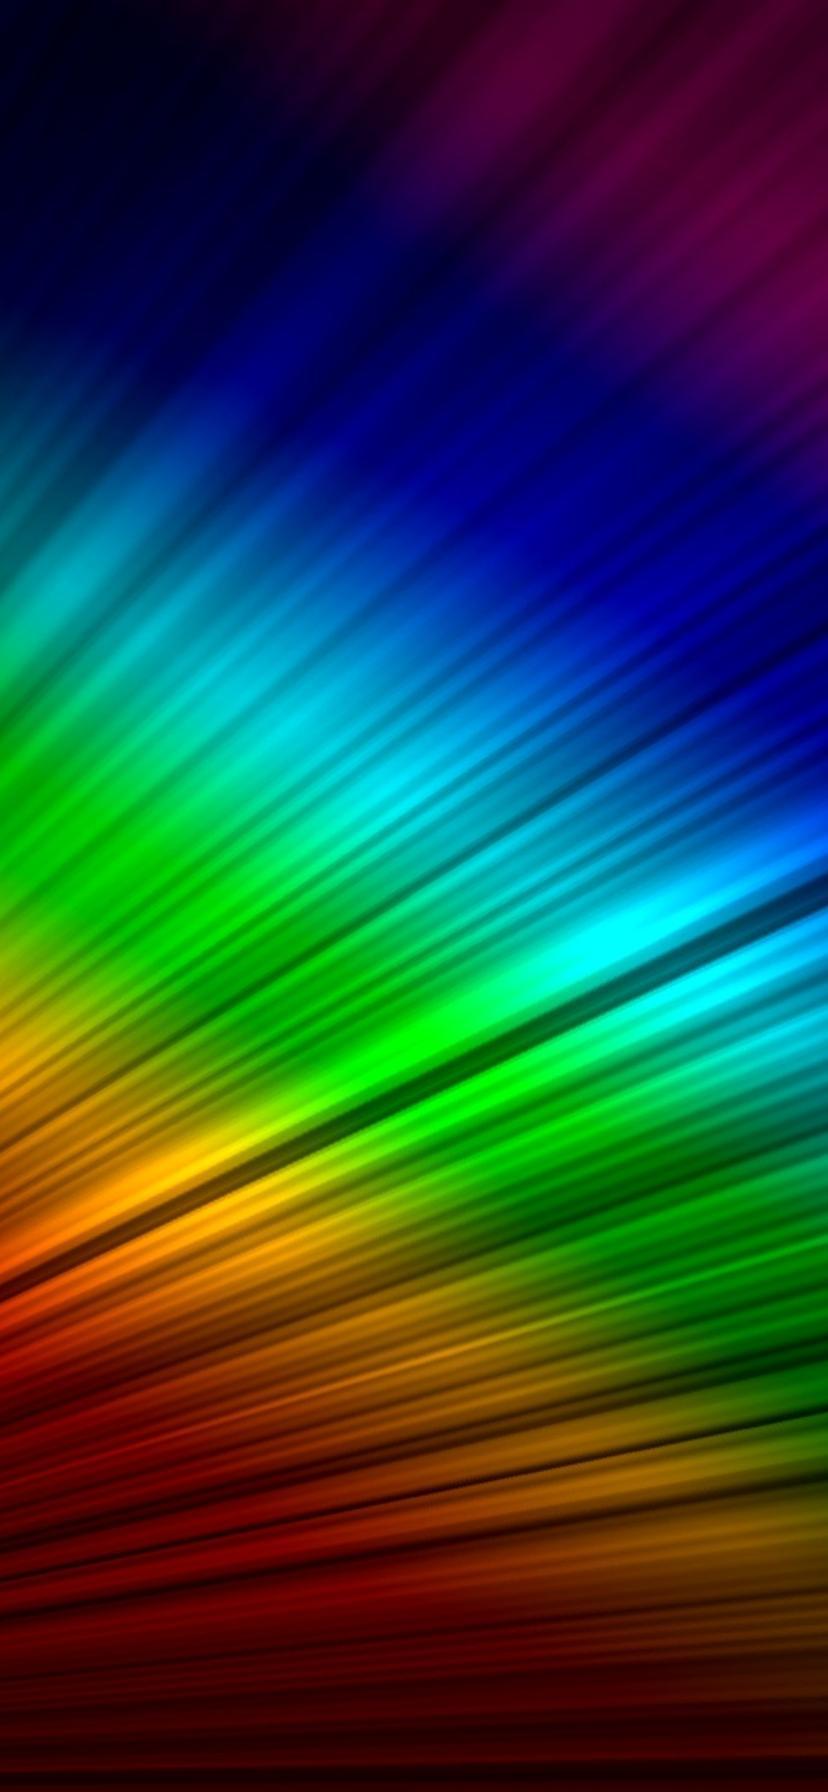 Rainbow On The Desktop Hd Wallpaper